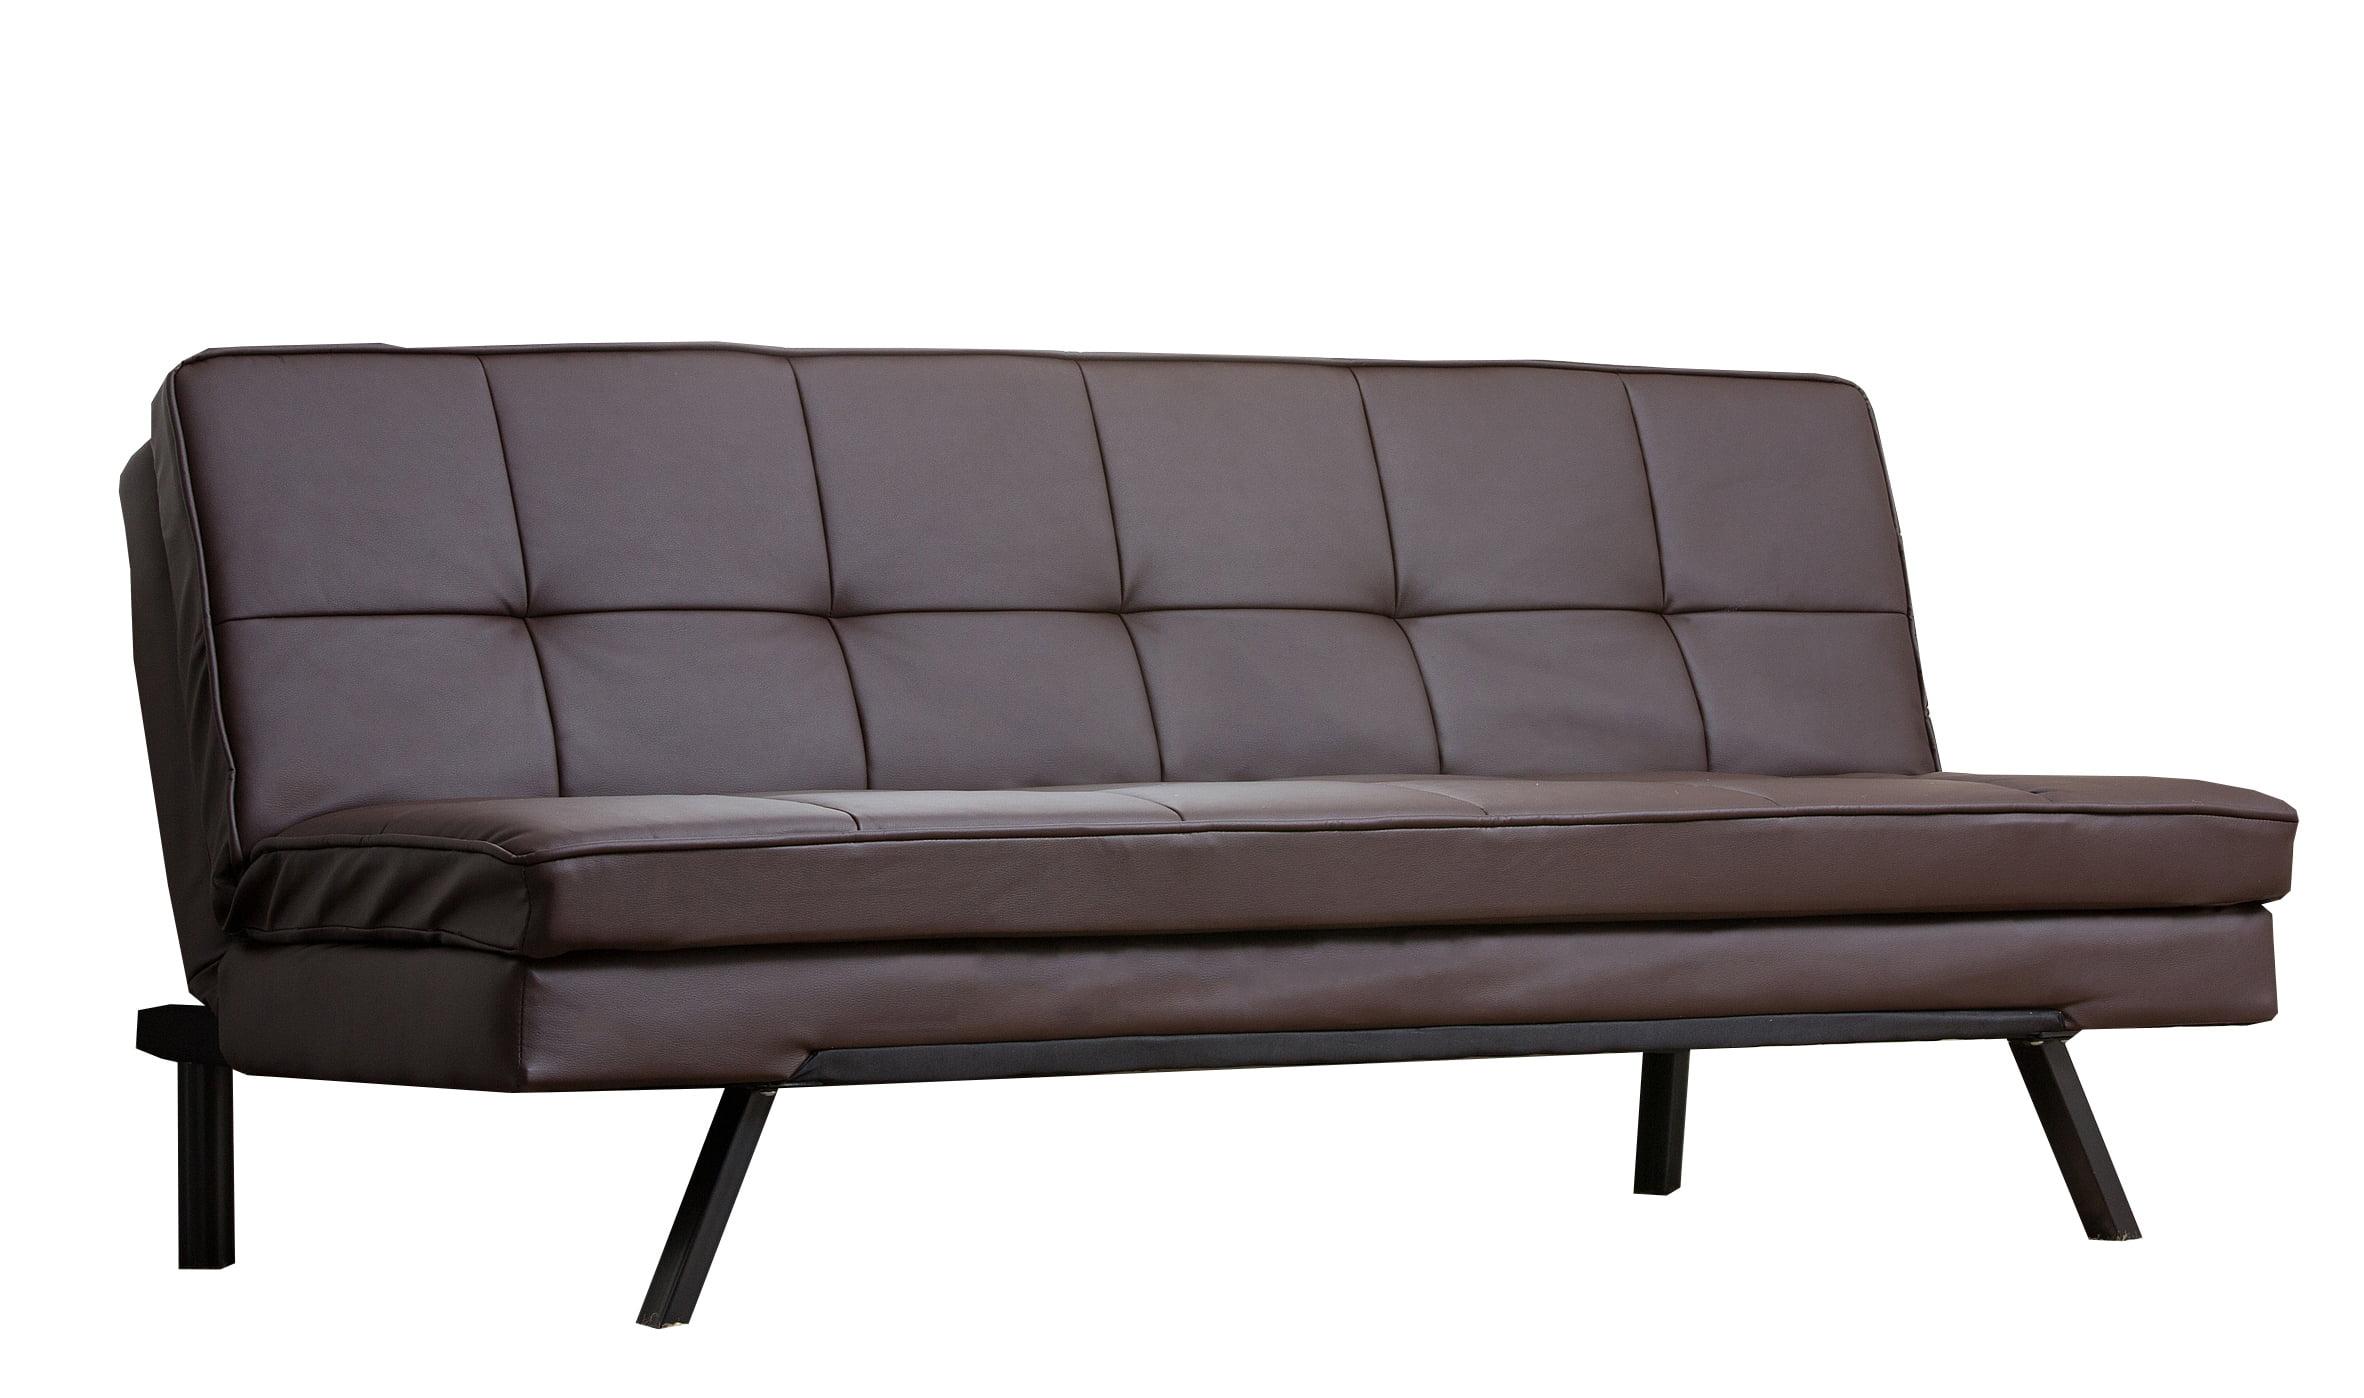 bella leather convertible futon sofa bed dark brown